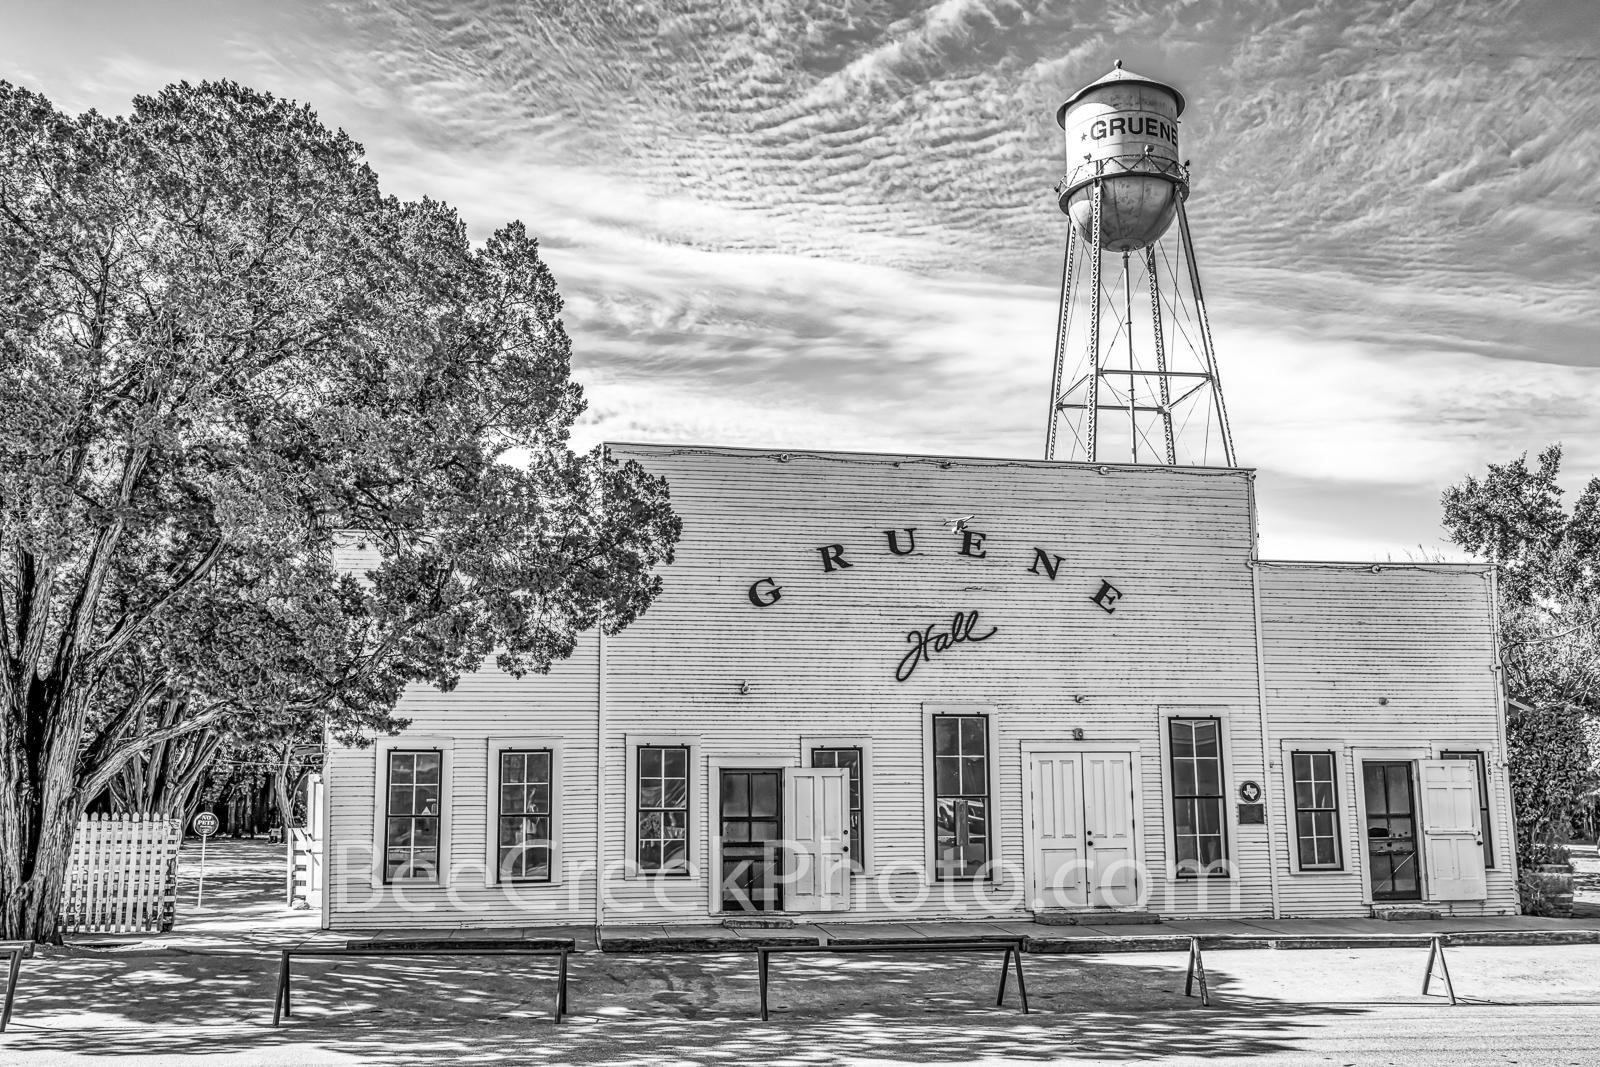 Gruene Hall, B W, black and whtie, Gruene Texas, dance hall, saloon, town, community, Earnest Gruene, german, german town,